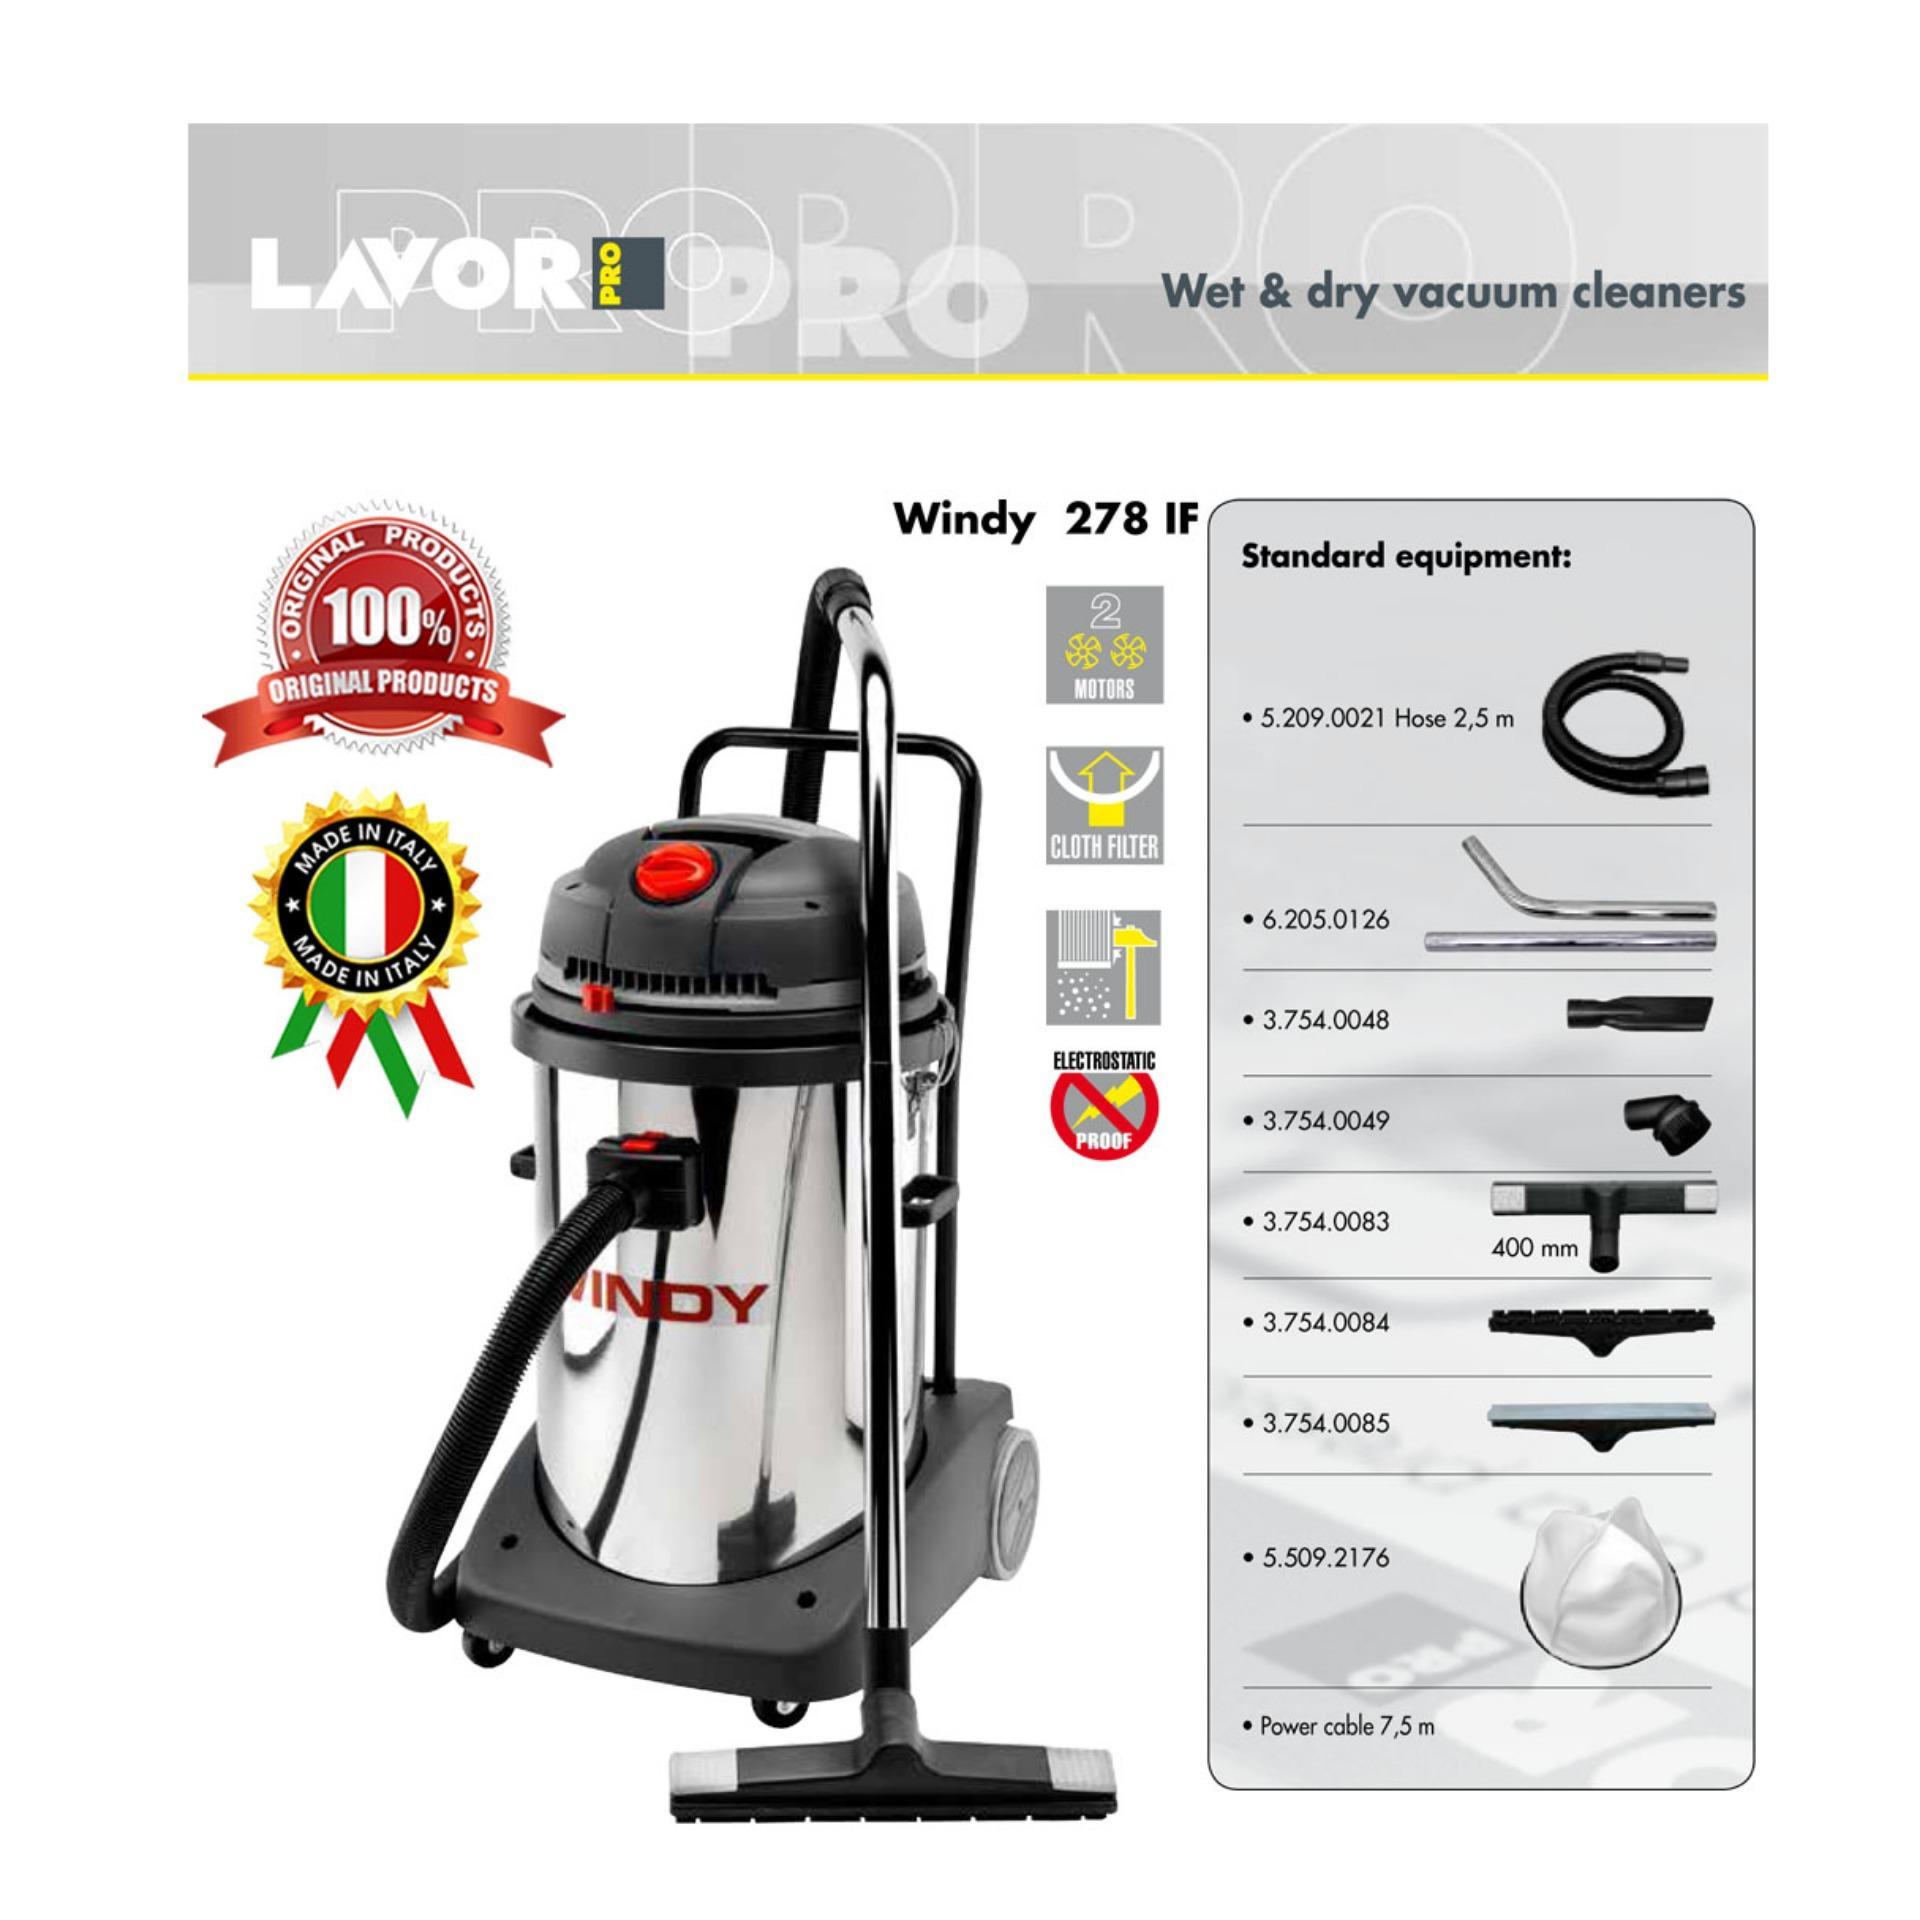 Cheap online VACUUM CLEANER - WET DRY - Windy 278 IF - LAVORPRO - MADE IN ITALY - Vacuum Cleaner -Alat Penyedot Debu - Alat Pembersih